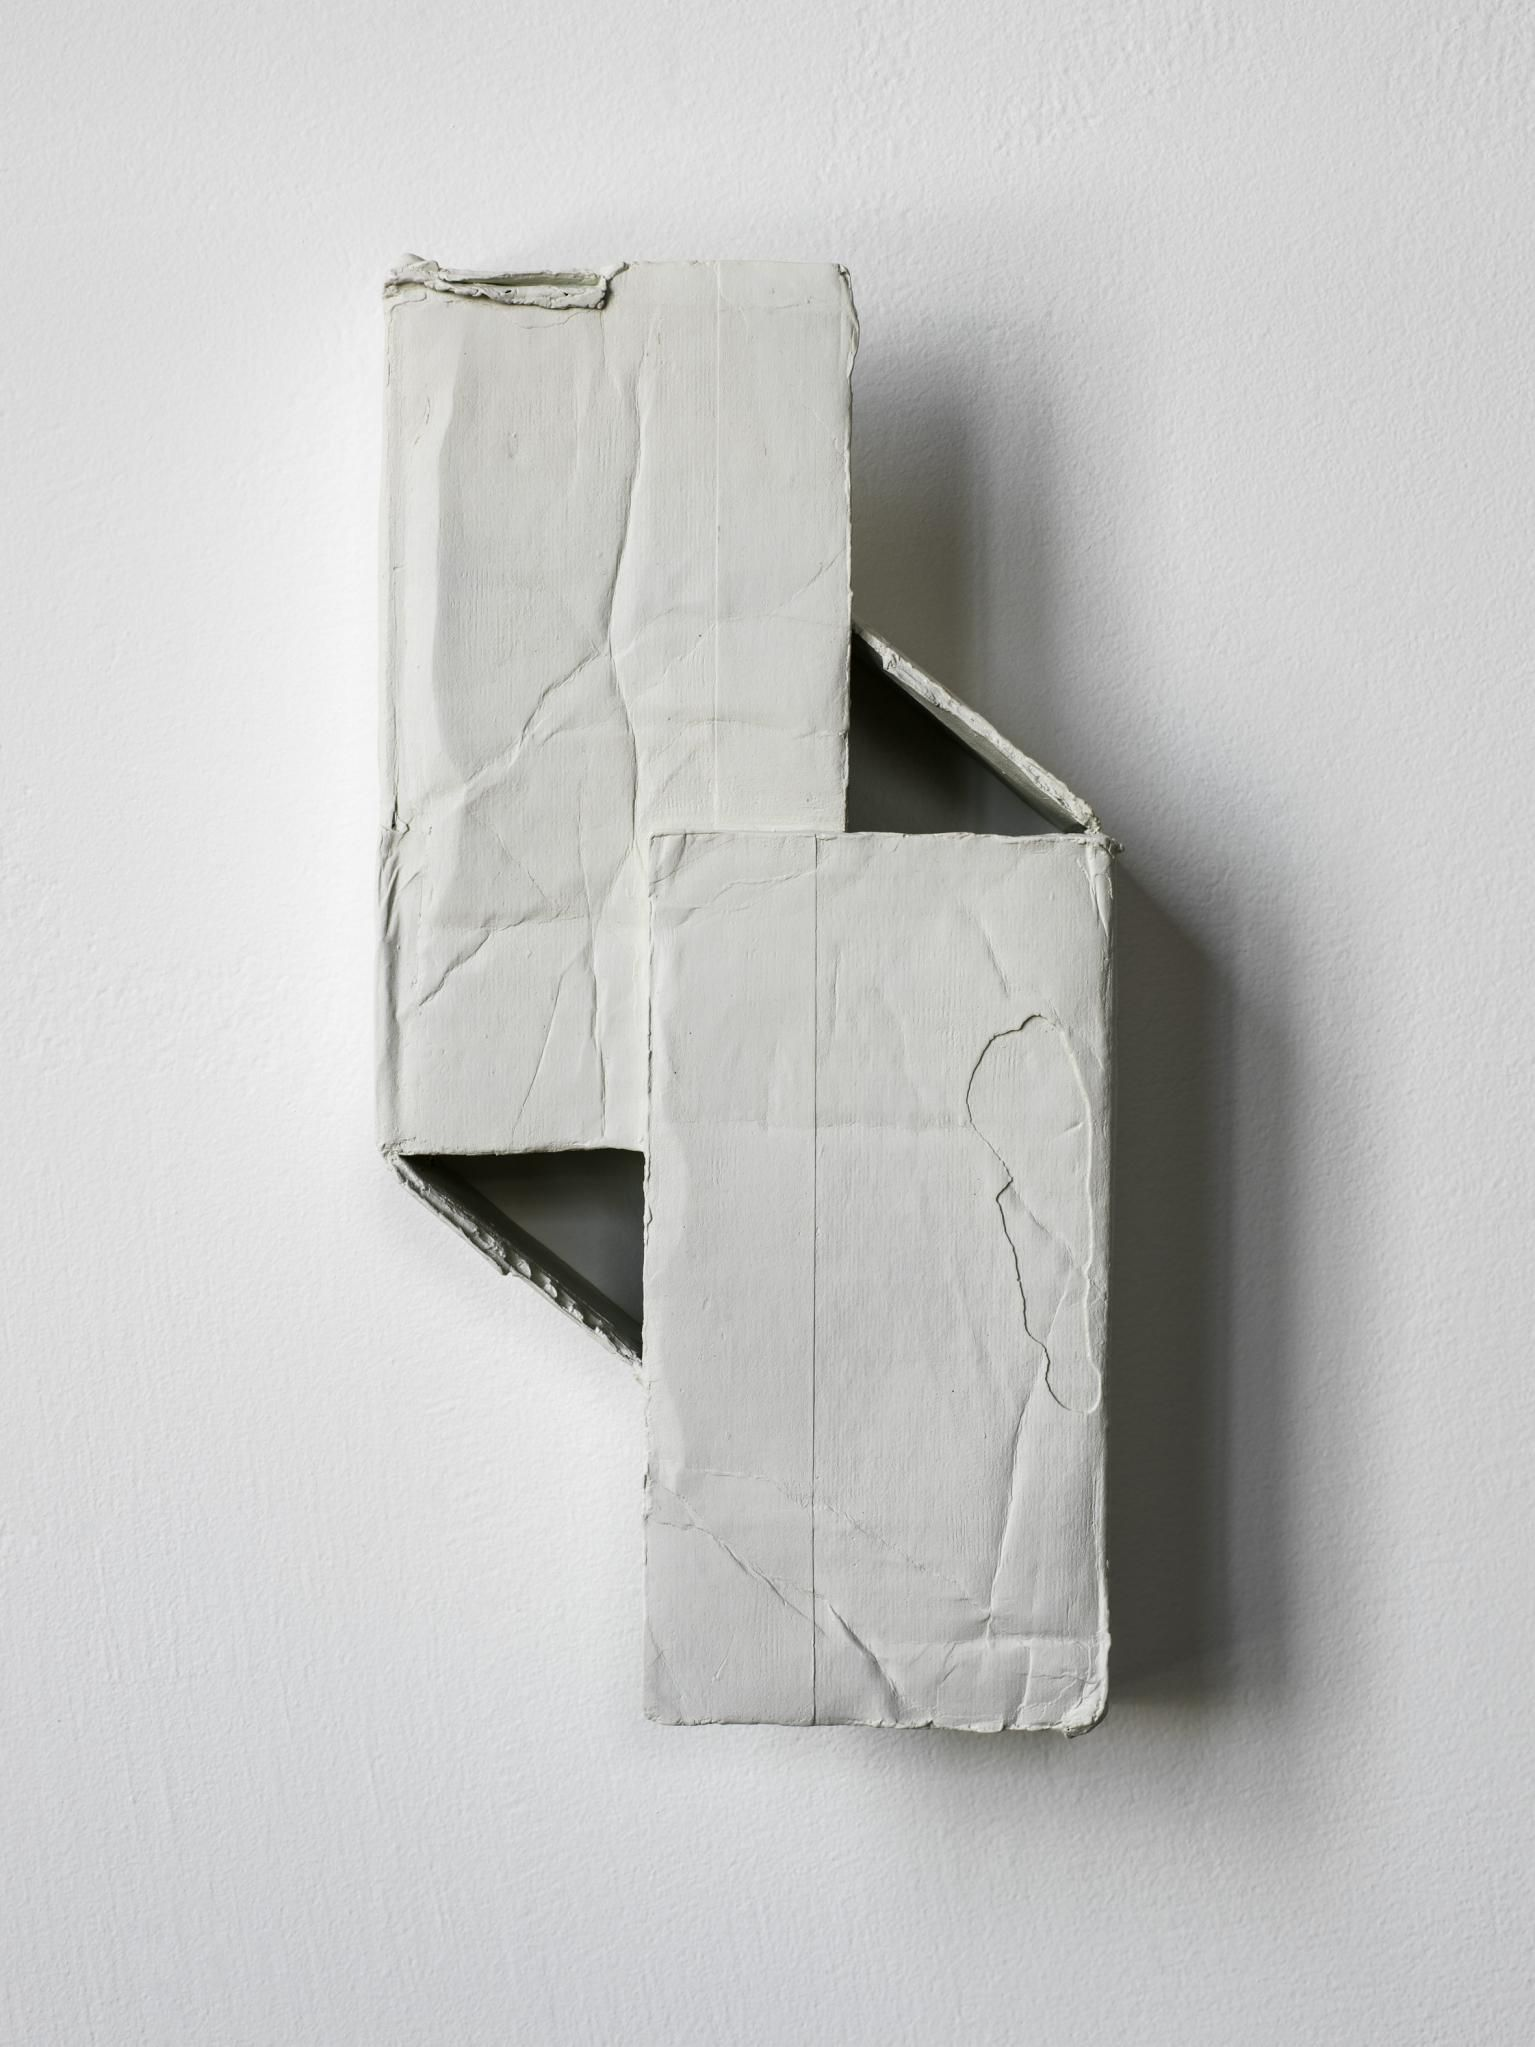 Ricky Swallow, Skewed Doors, 2013, patinated bronze